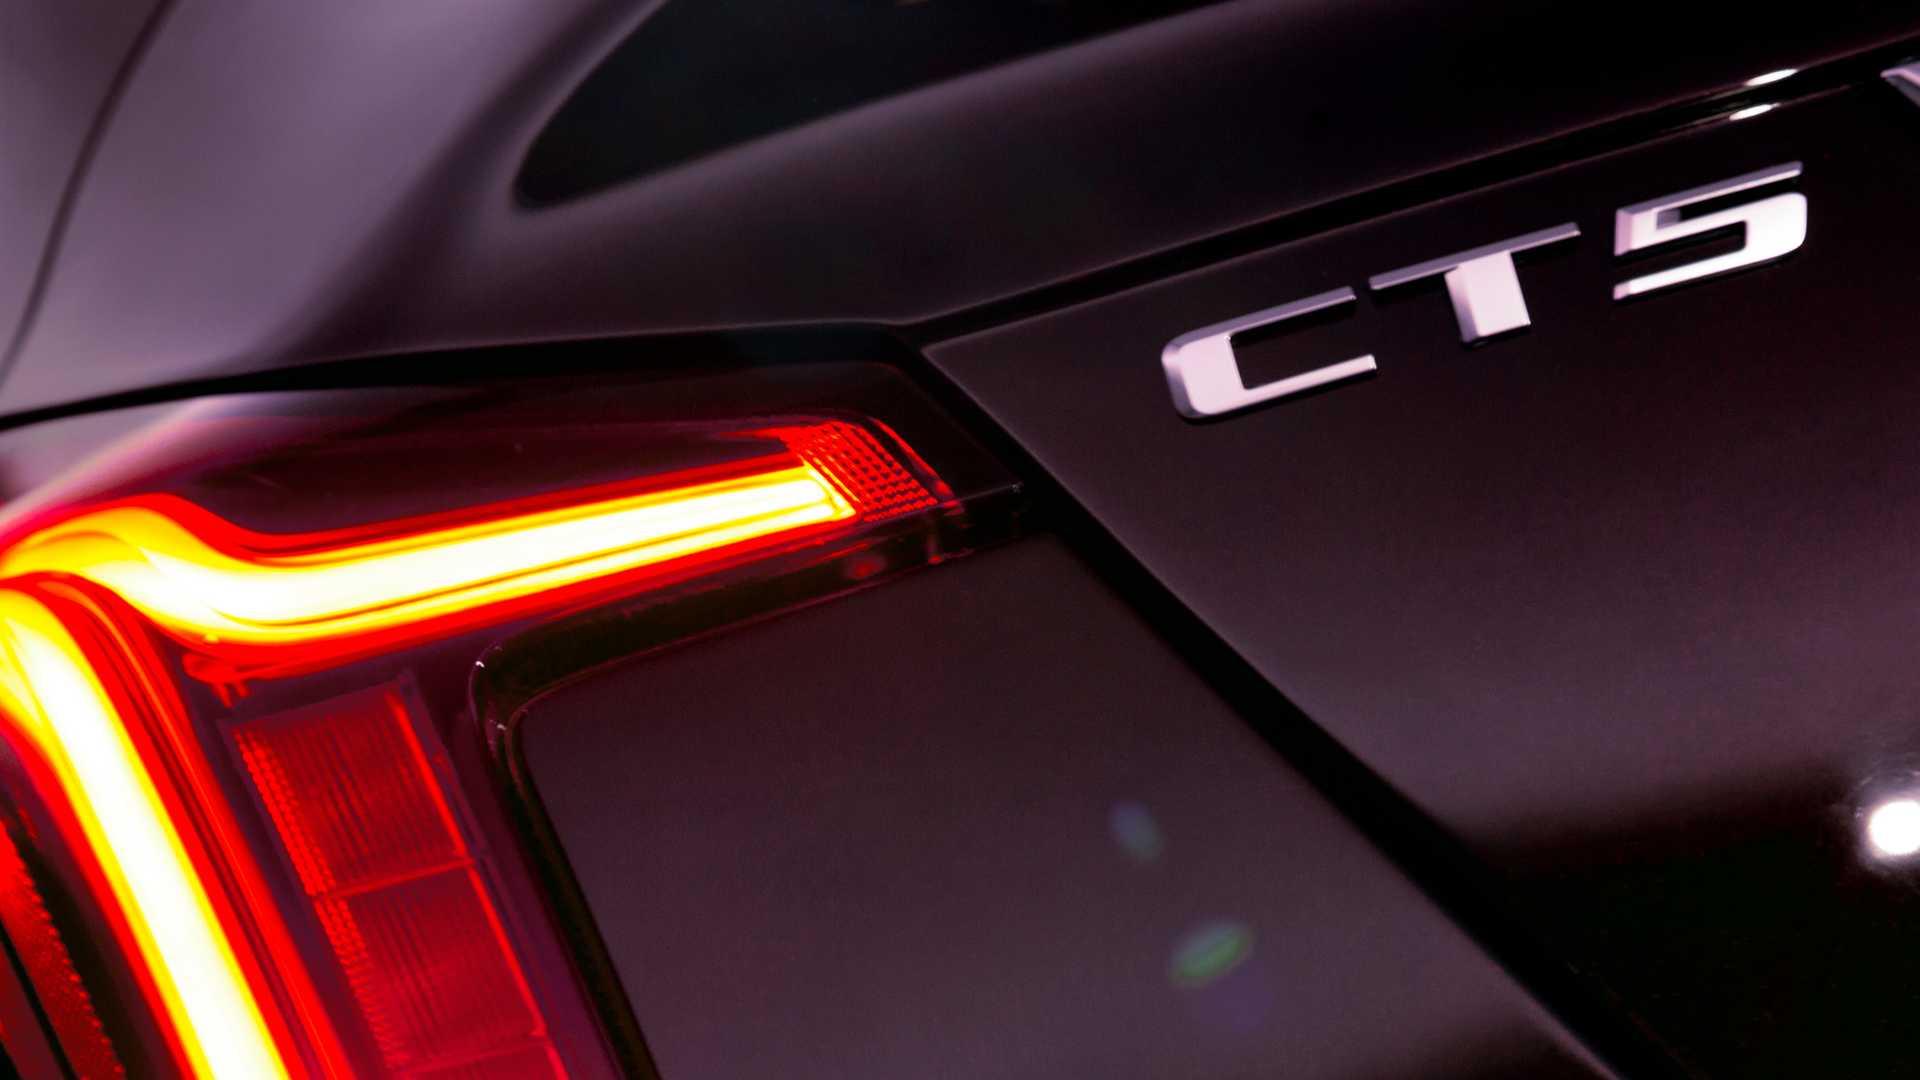 2020 Cadillac CT5 Premium Luxury Tail Light Wallpaper (12)